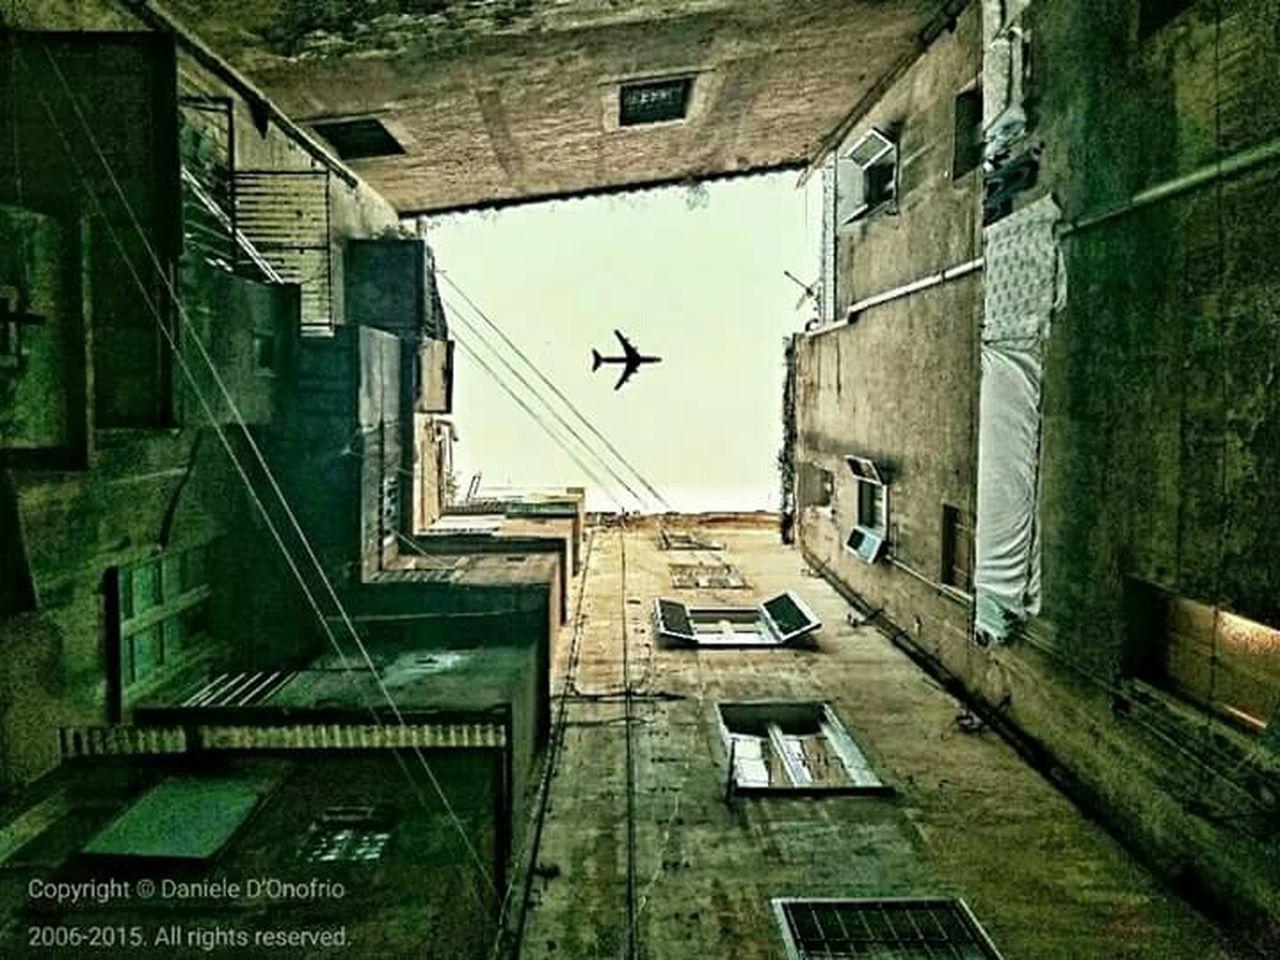 Cortili Aperti A Testa Alta Aereoplano Airplane Luckyshot Streetphotography Streetphoto_color Street Photo Fotografia Landscape Foto Di Danieledonofrio Roma